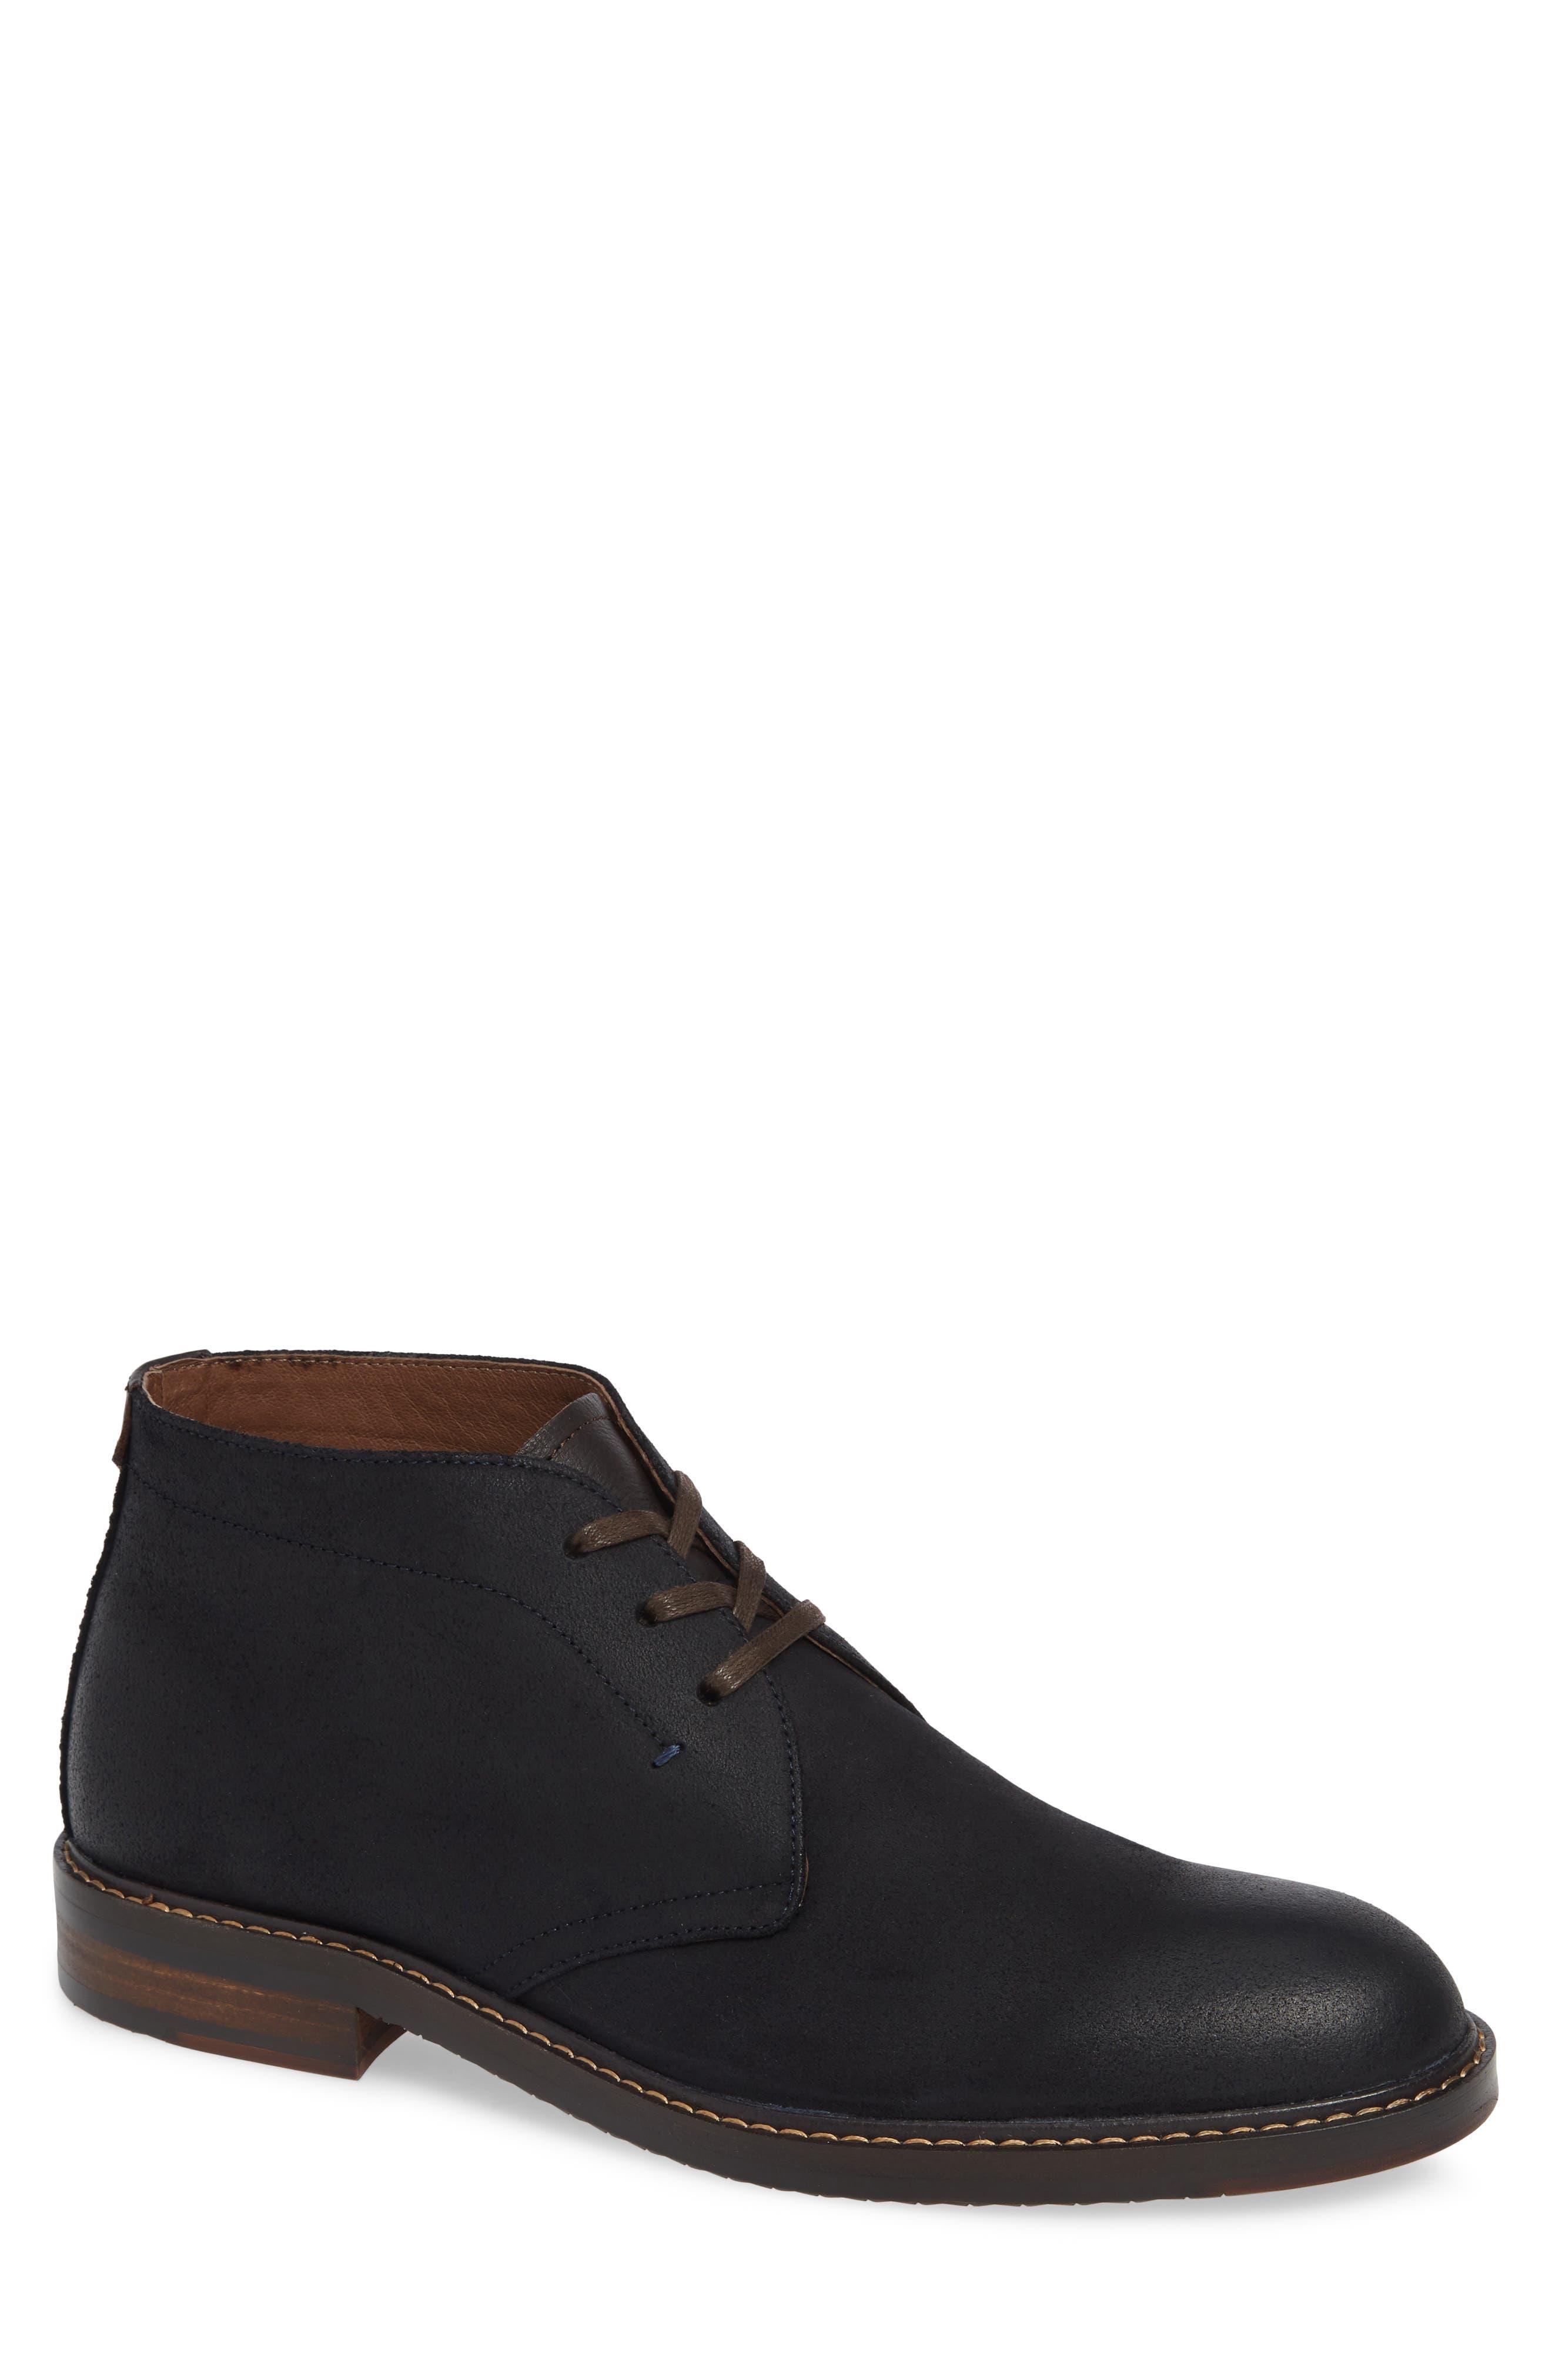 Auburn Chukka Boot,                         Main,                         color, MIDNIGHT SUEDE